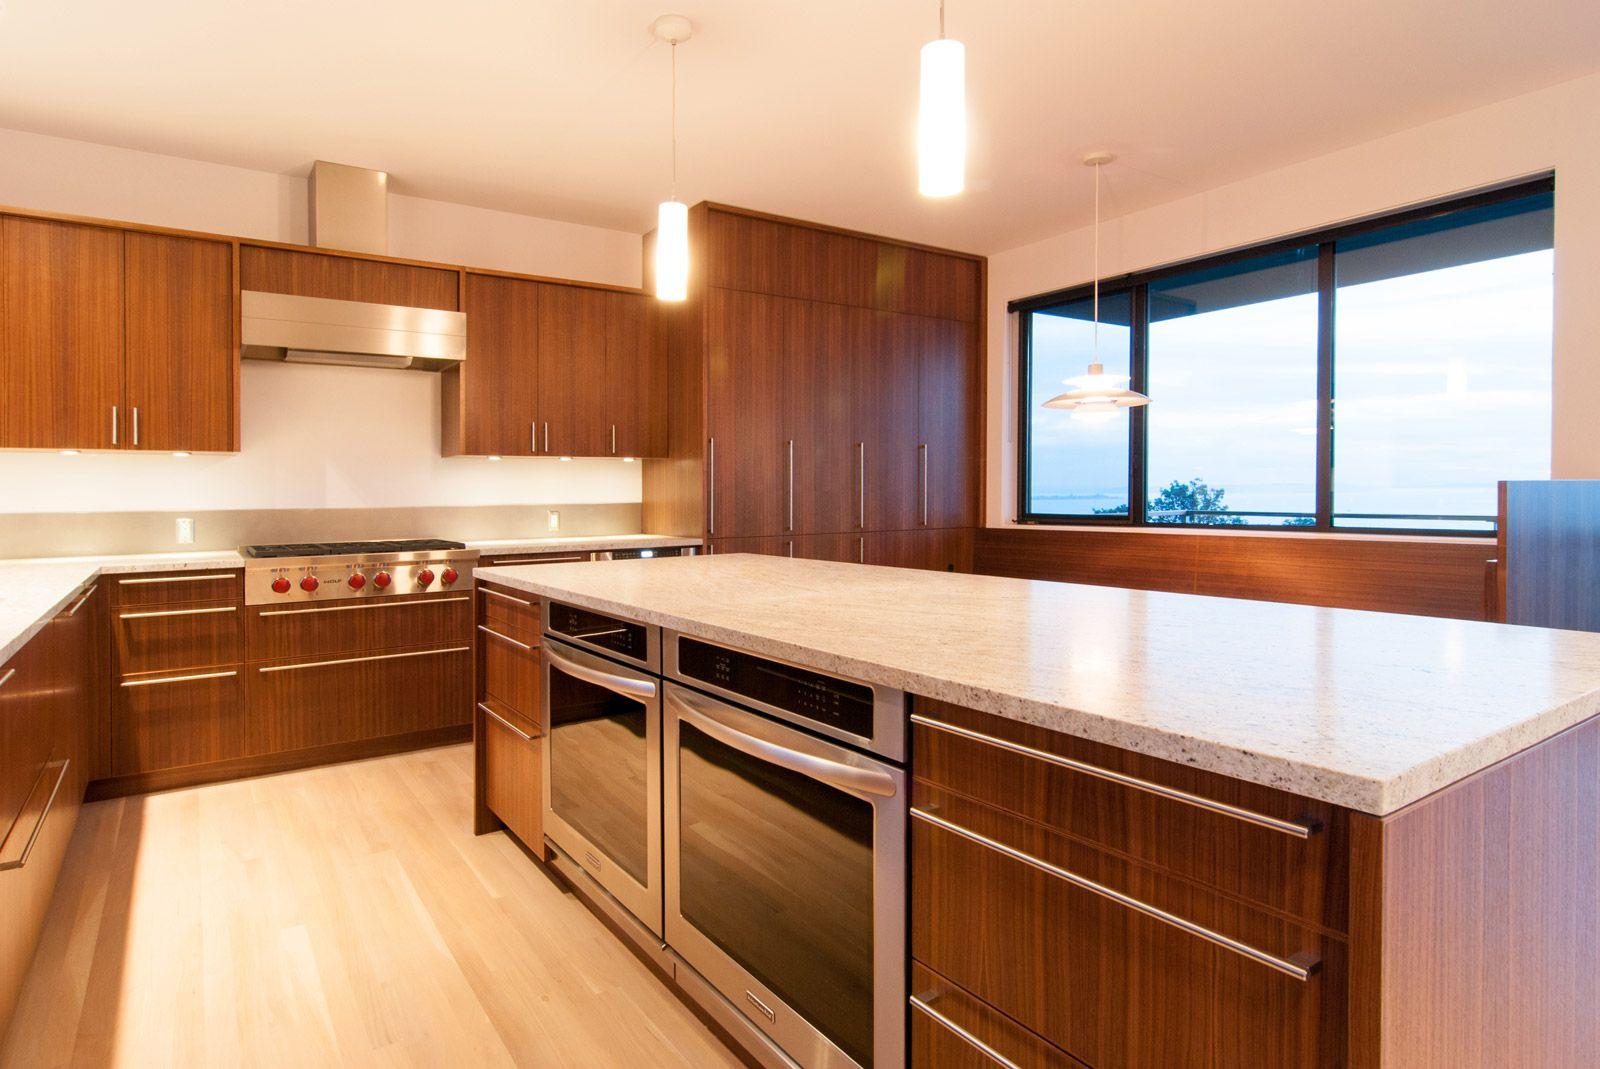 best images about kitchen colors on pinterest black granite